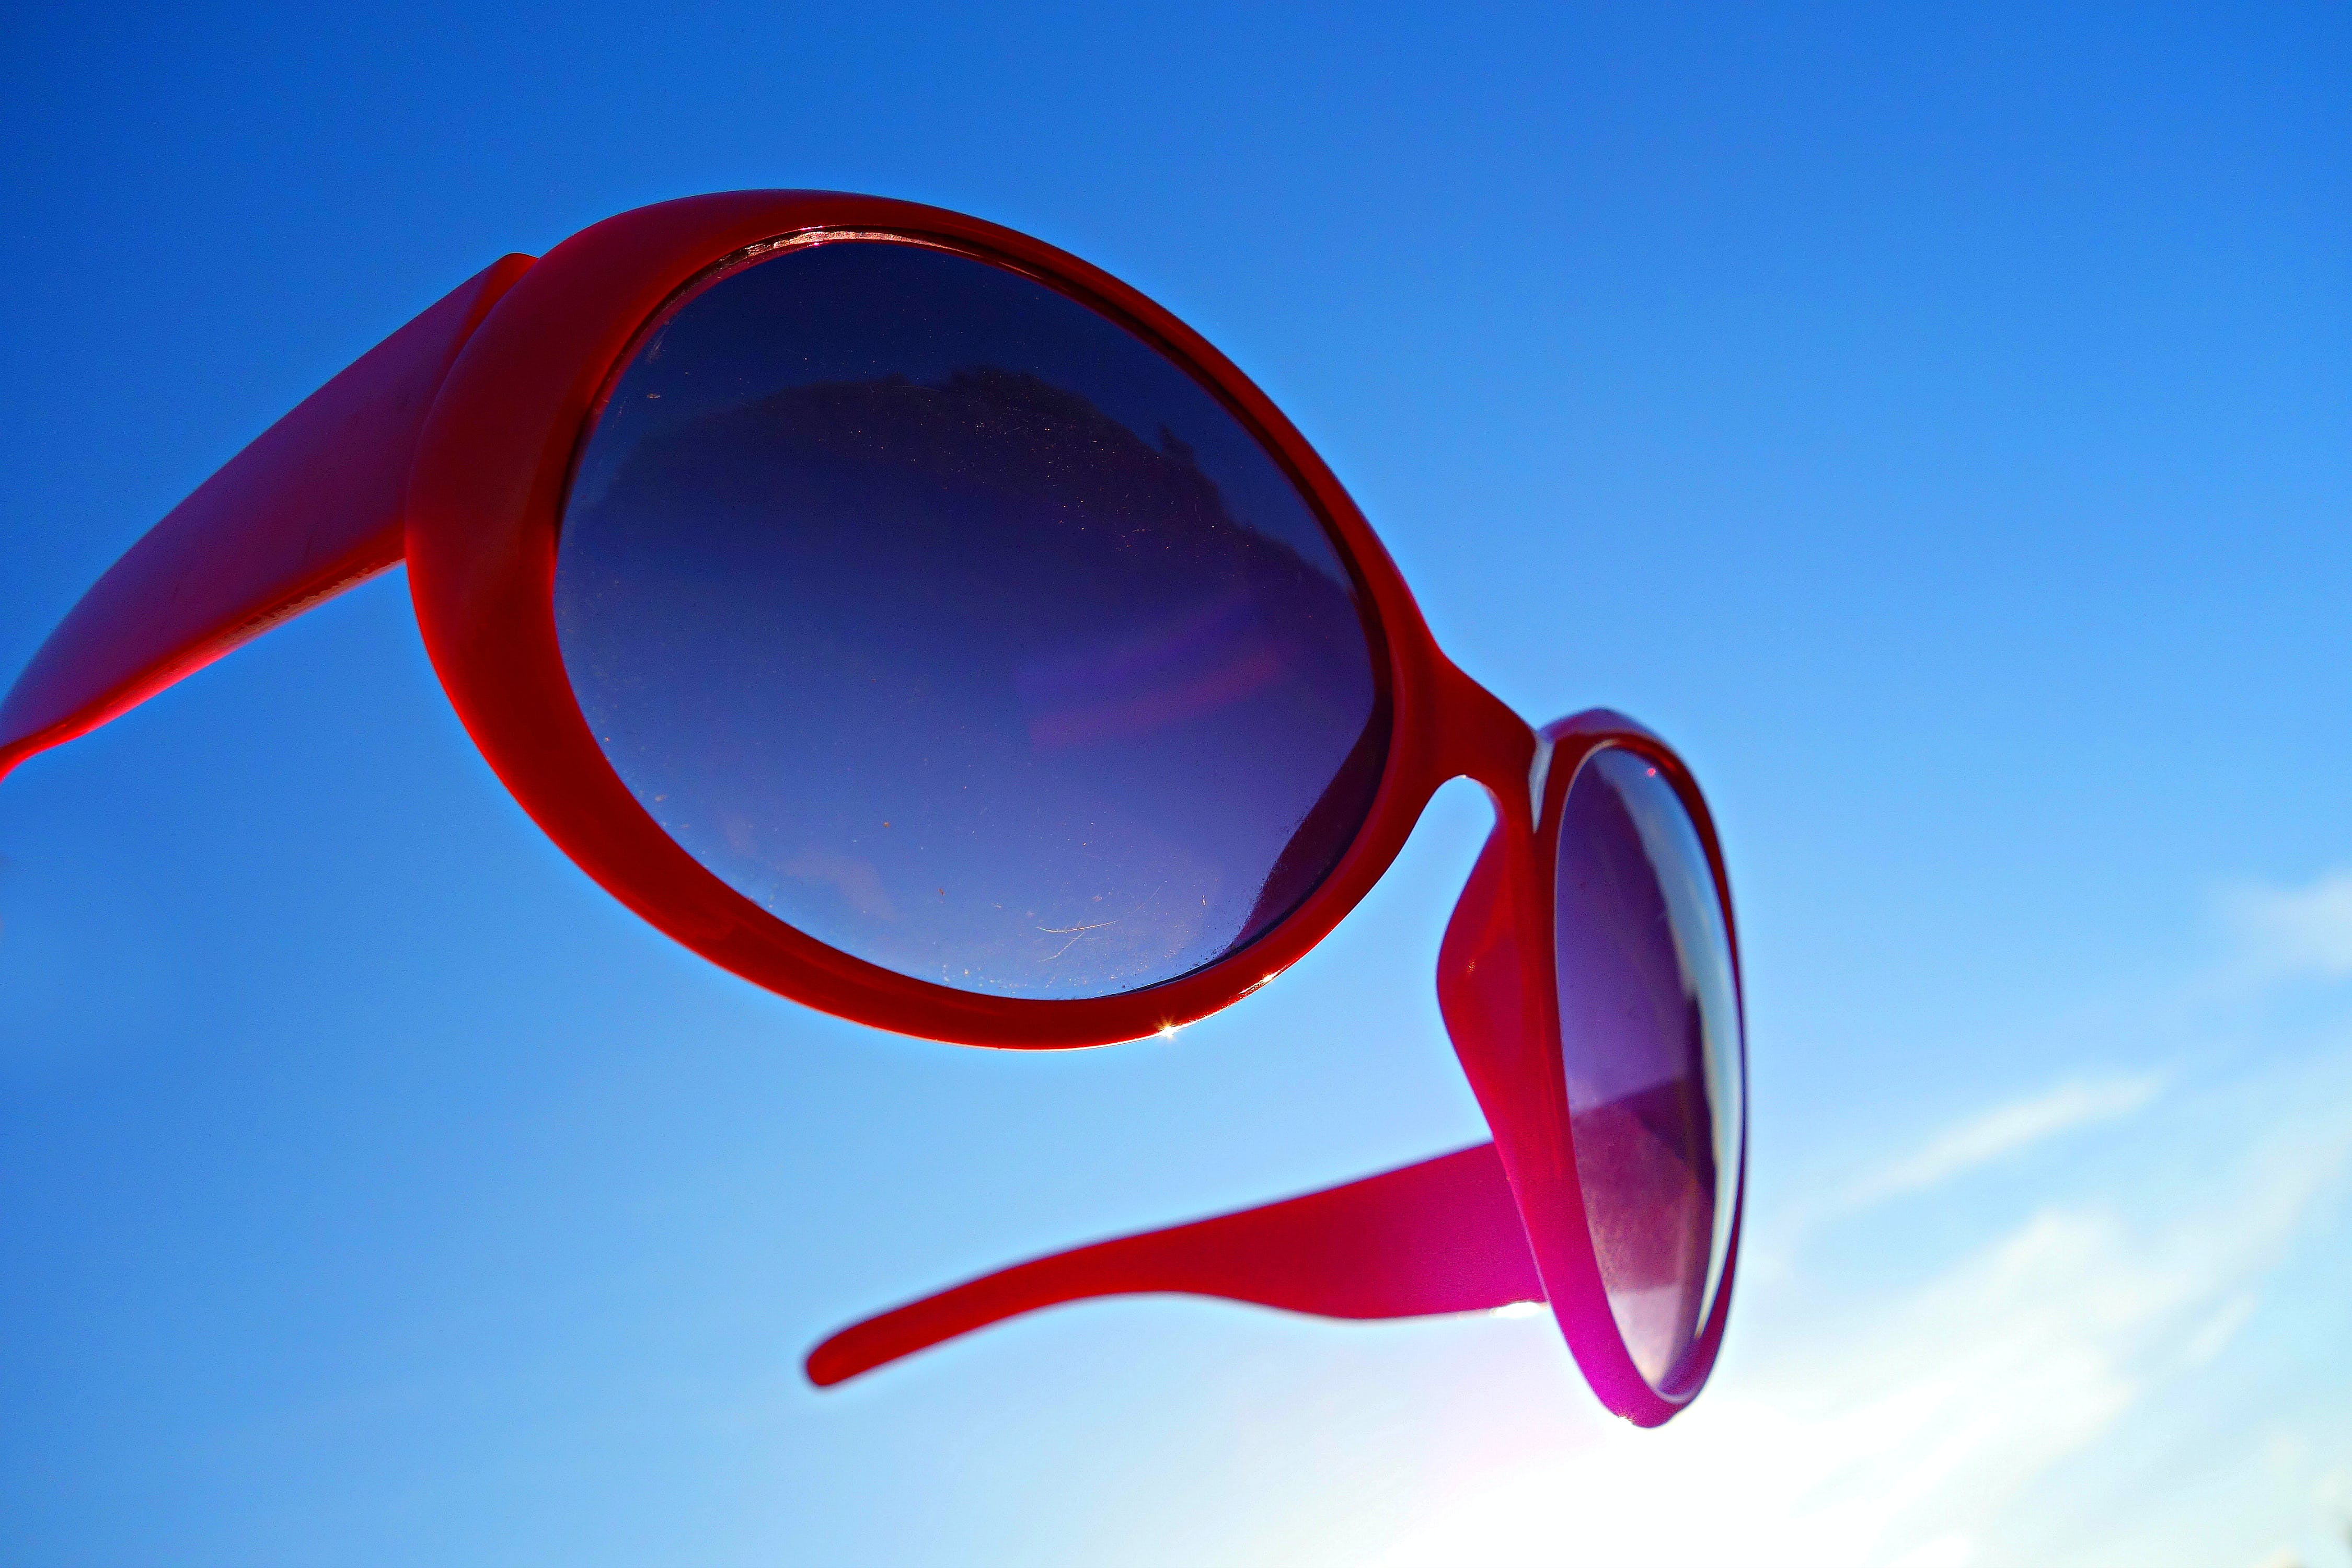 Free stock photo of fashion, sunglasses, sun, glasses